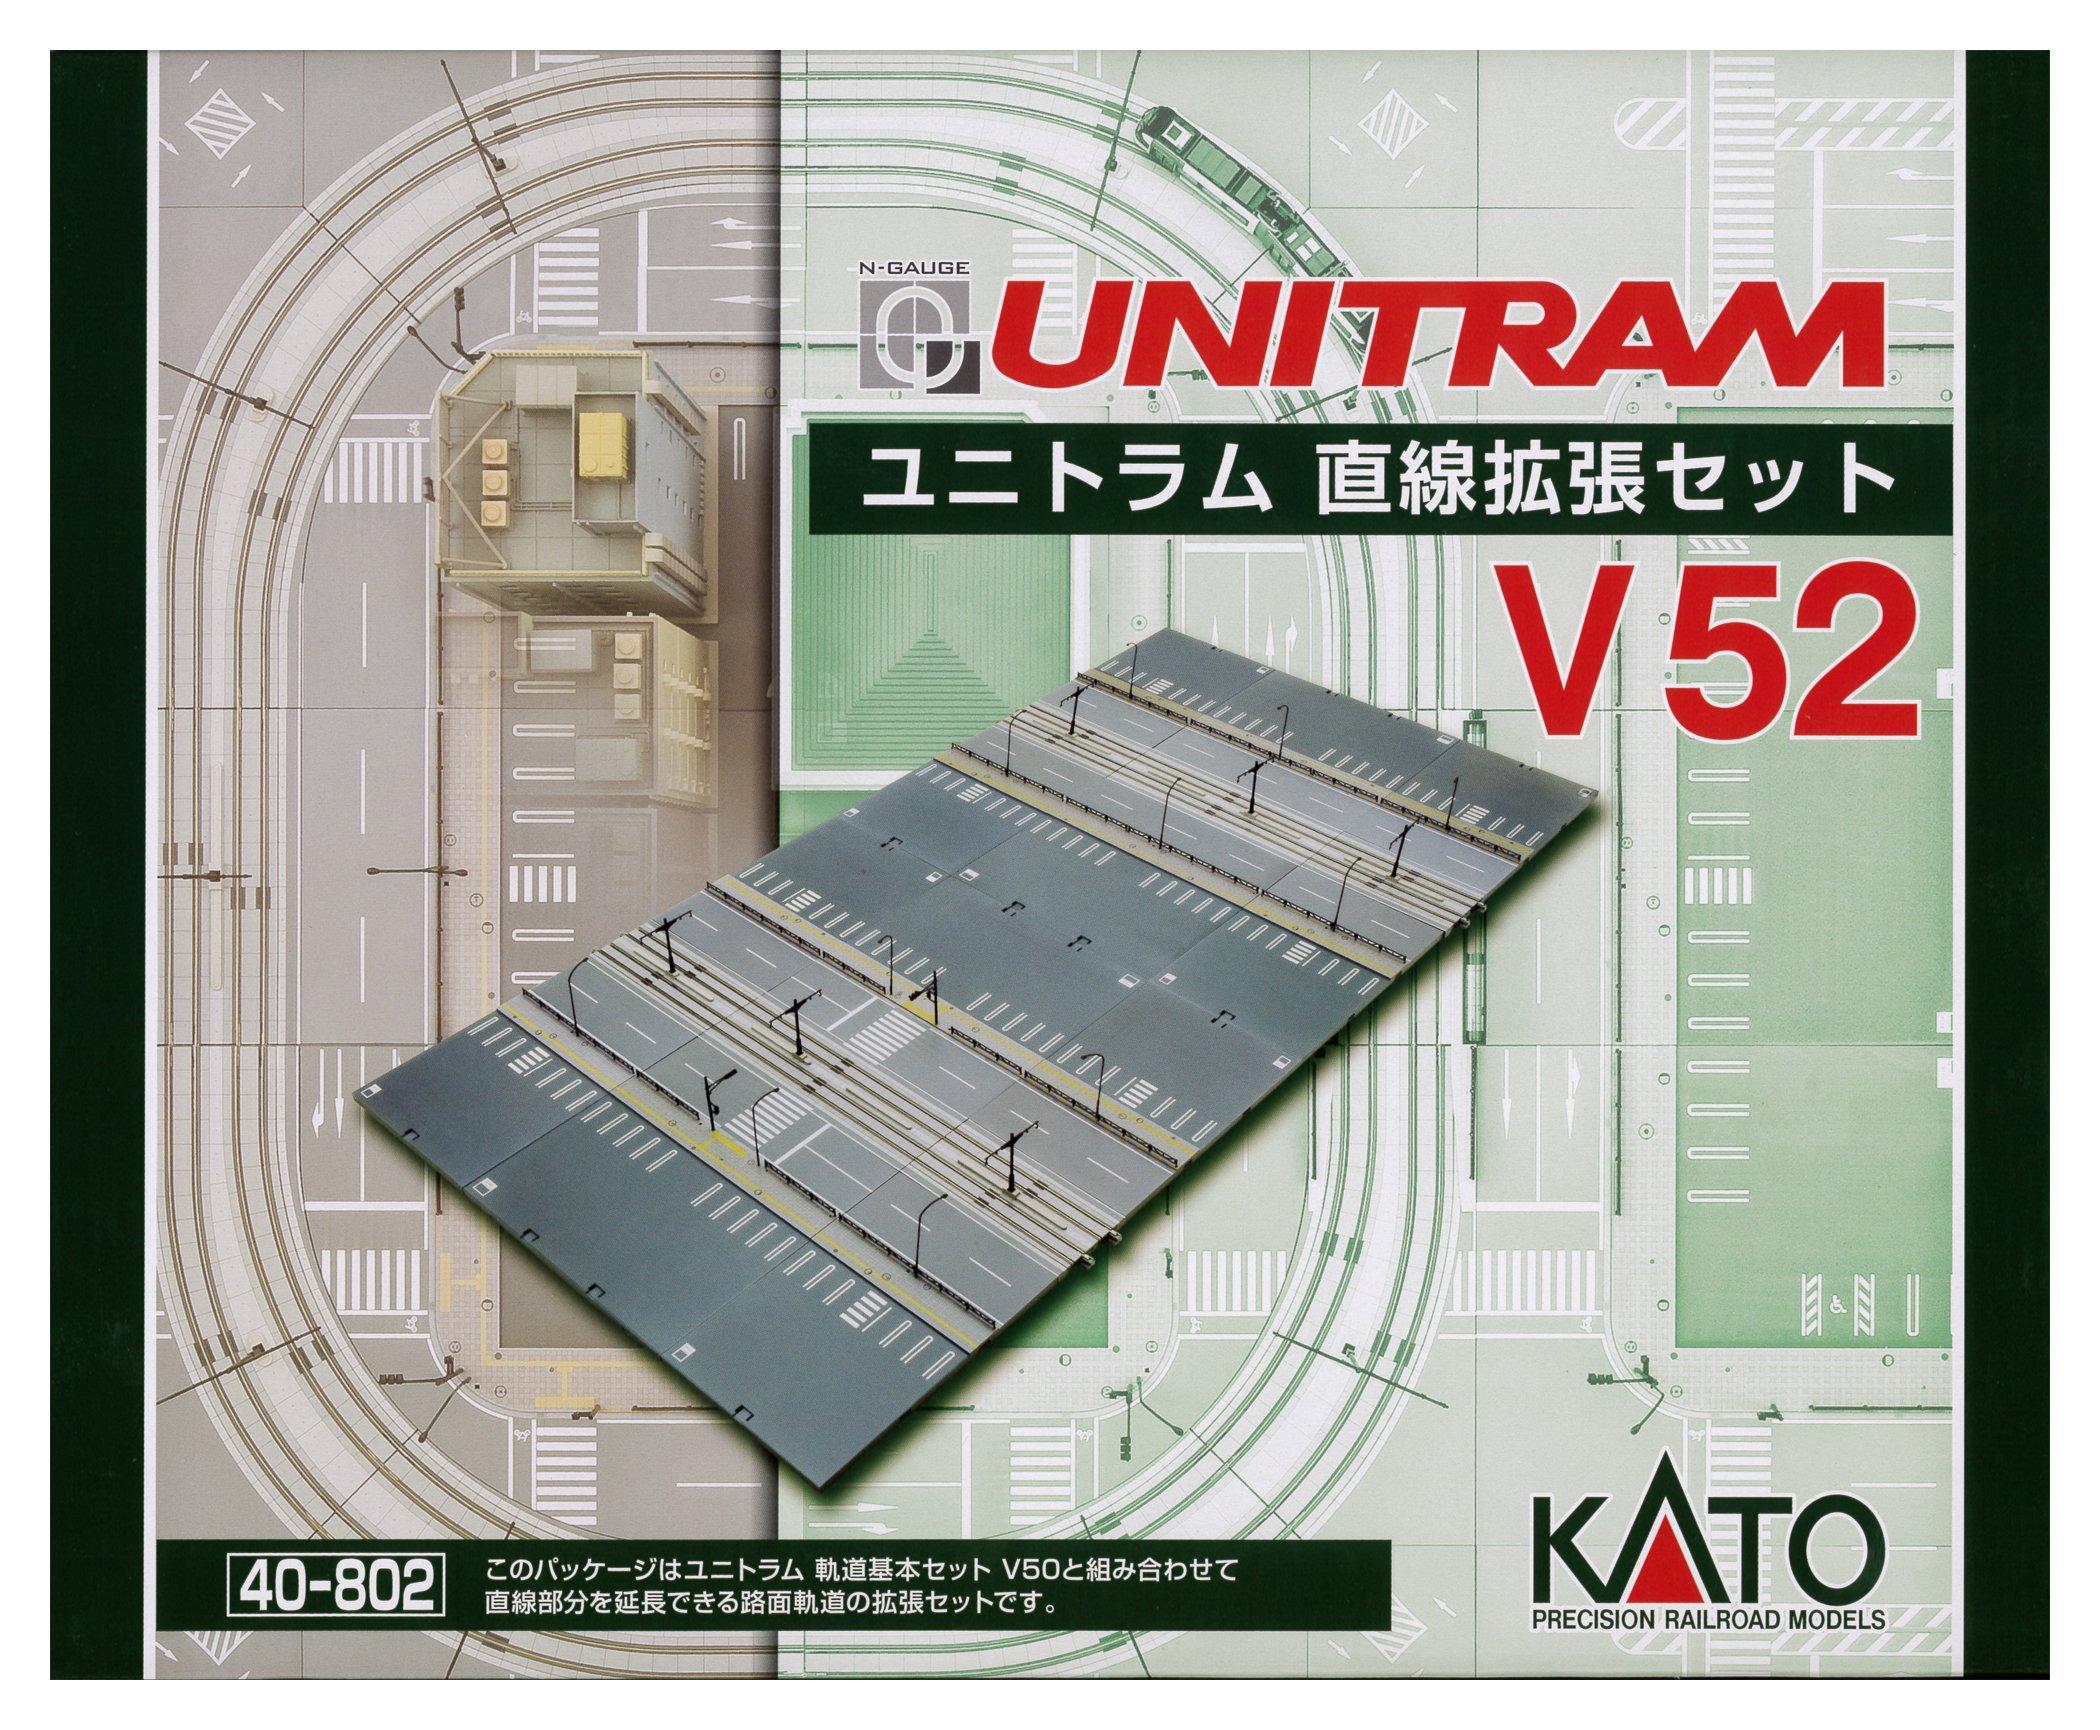 KATO 40-802 V-52 UNITRAM expansion set straight lineyJapanese railroad modelz